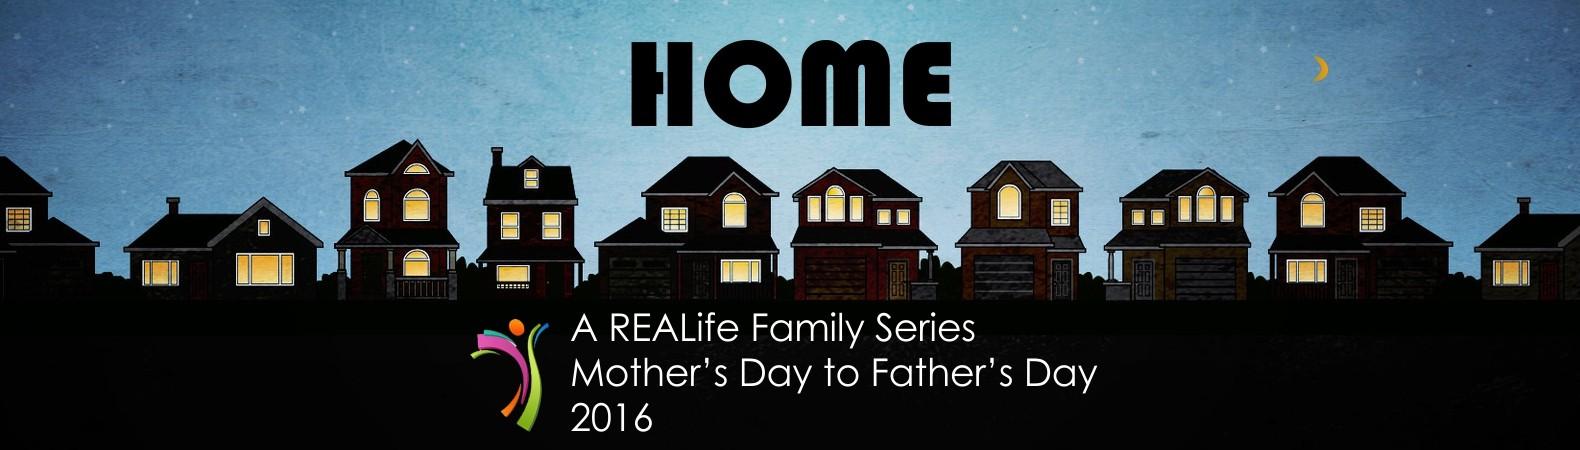 Home Series-edit